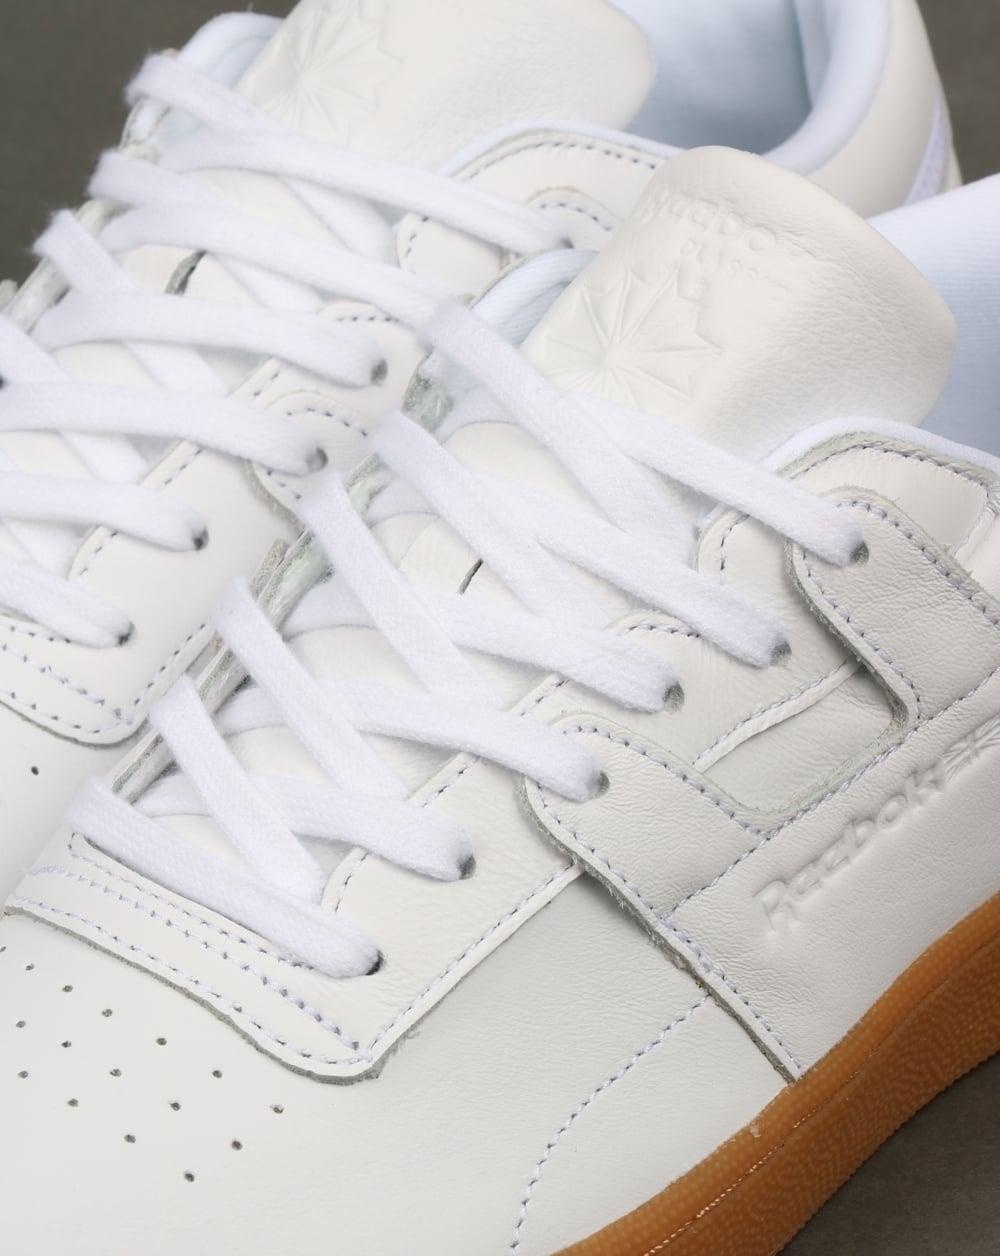 5946f64616a Reebok Club Workout Trainers White Gum